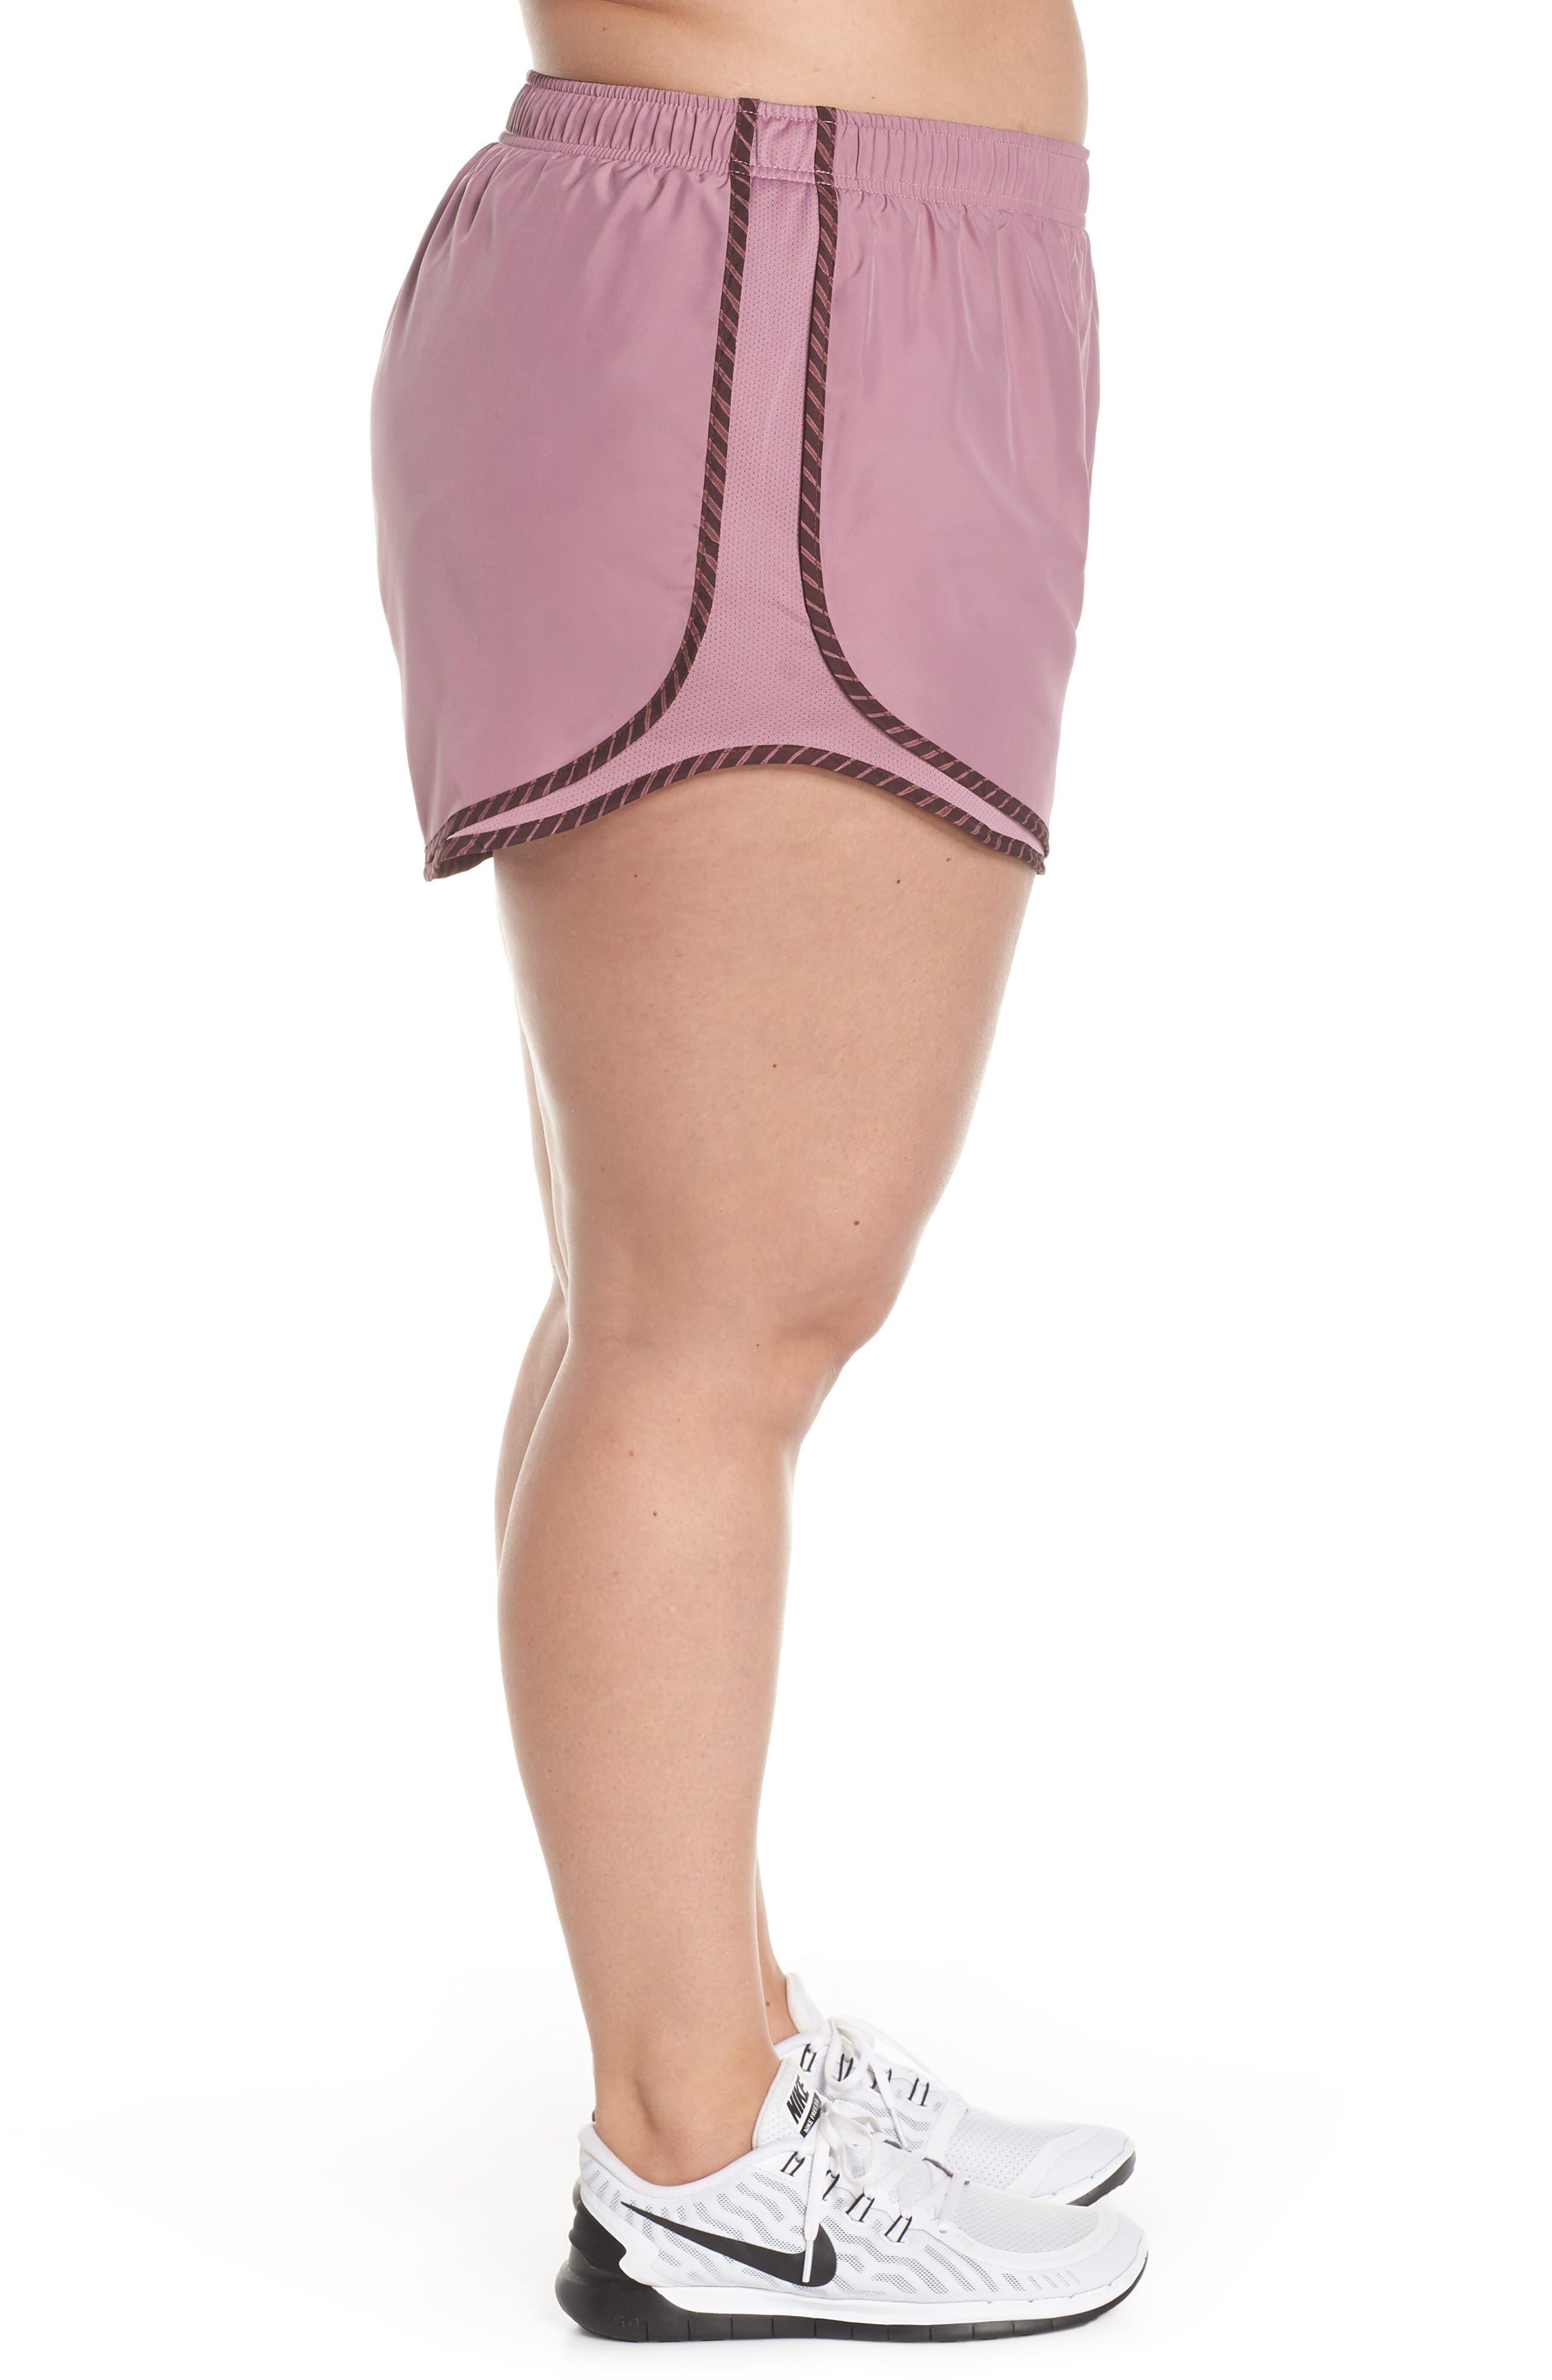 NIKE, Dry Tempo High Rise Running Shorts, Alternate thumbnail 4, color, PLUM/ EL DORADO/ WOLF GREY